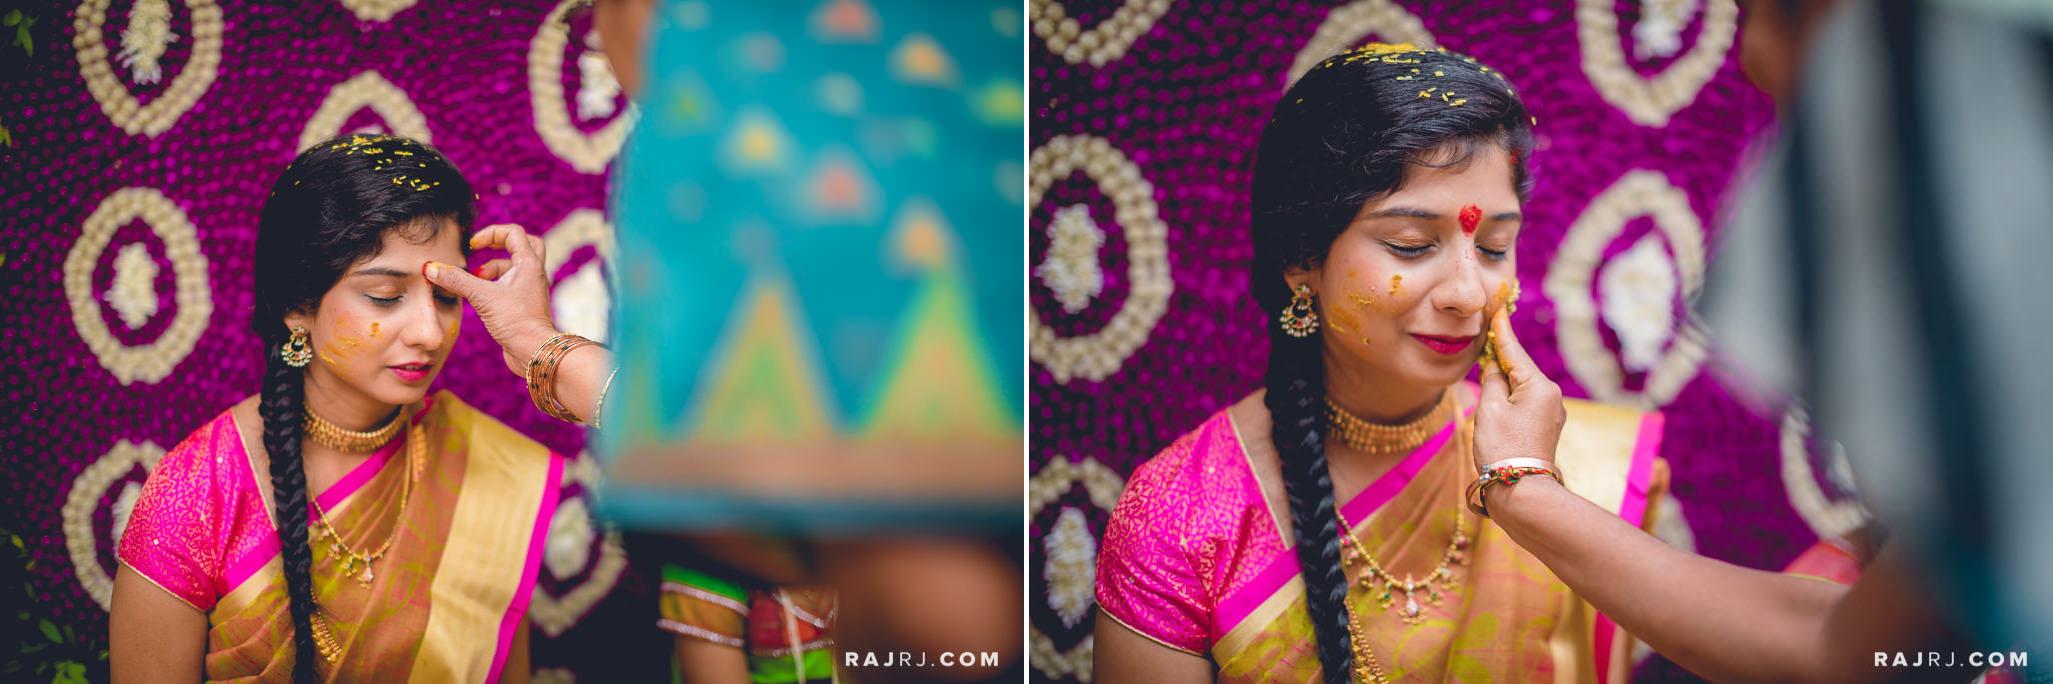 Bangalore_Telugu_Wedding_Bhavana_Dilip-5_1.jpg